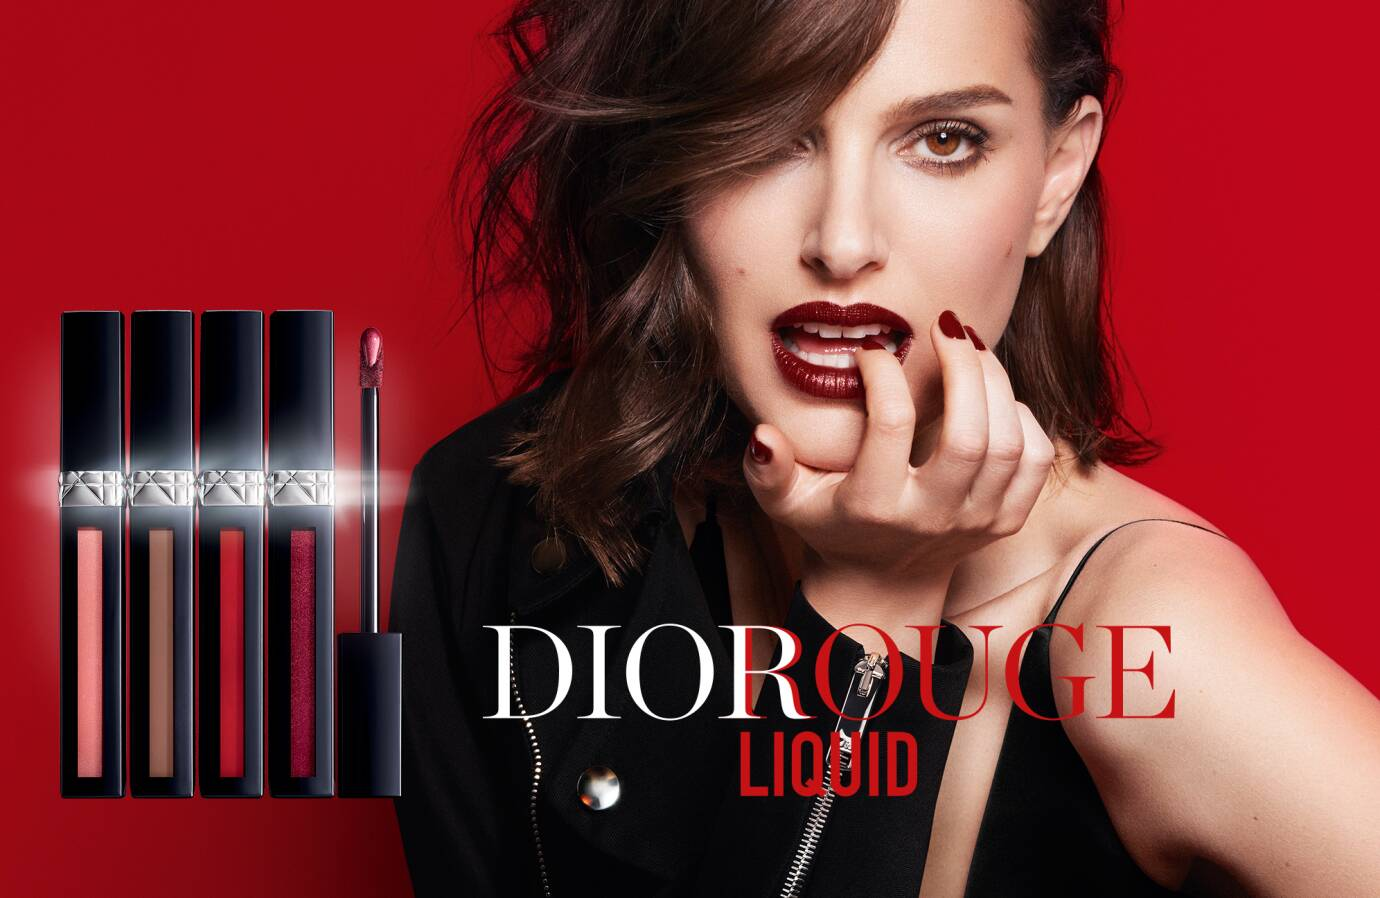 Parfums Christian Dior, fragrances - Perfumes & Cosmetics - LVMH